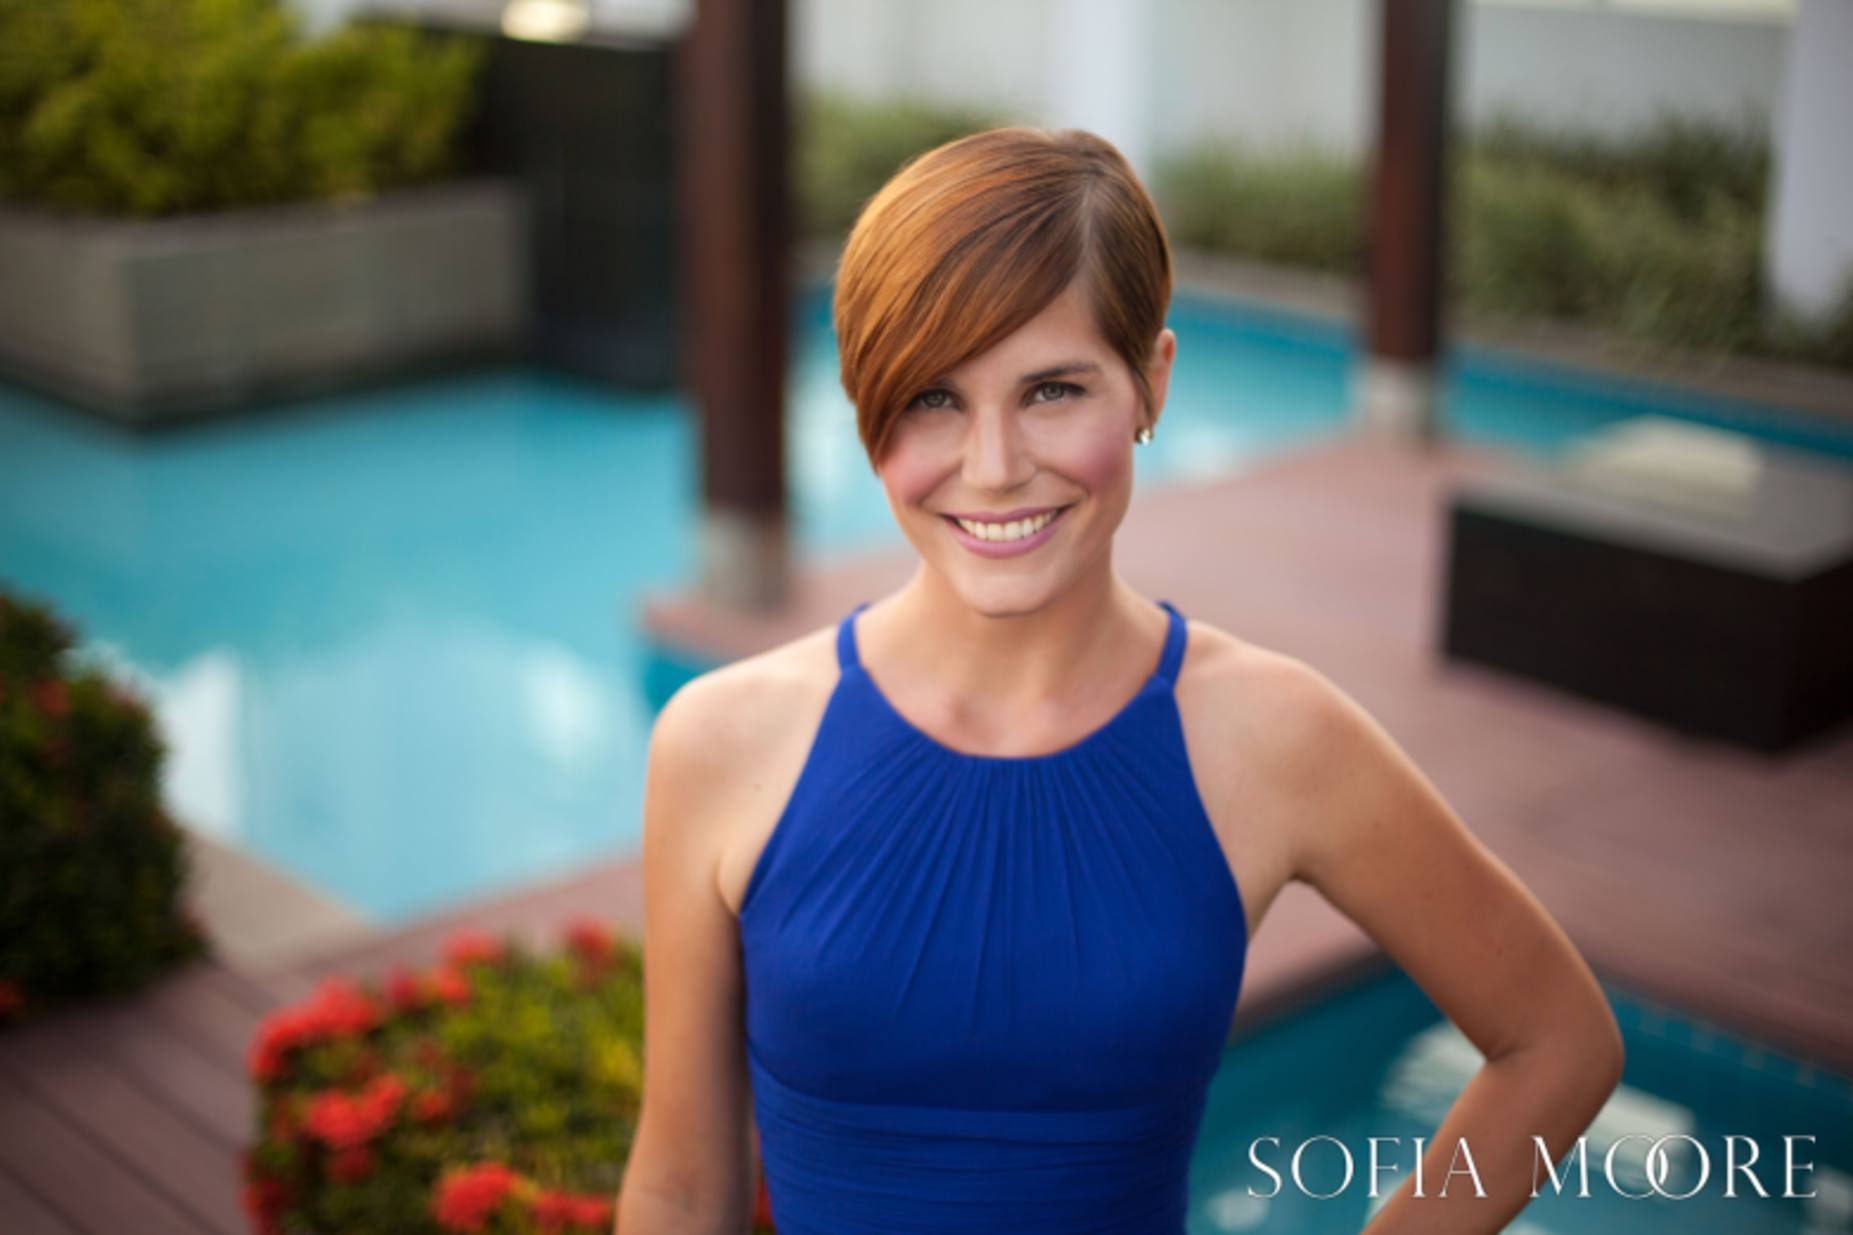 Sofia Moore svensk e-handlare - Sendify